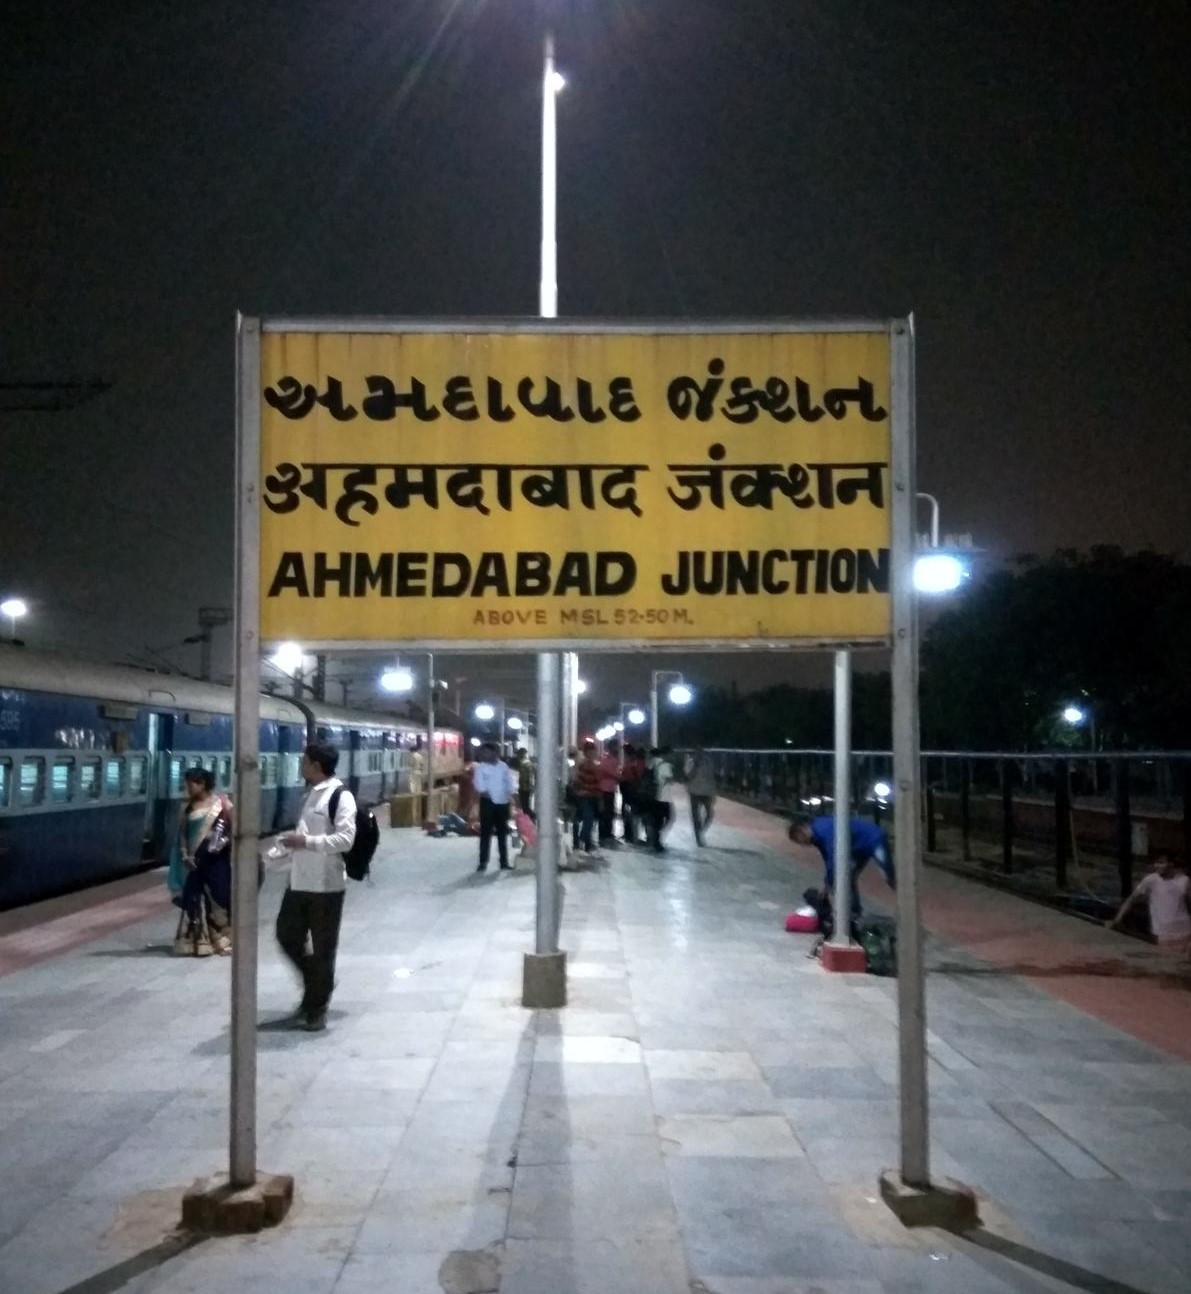 ahmedabad rly station-1